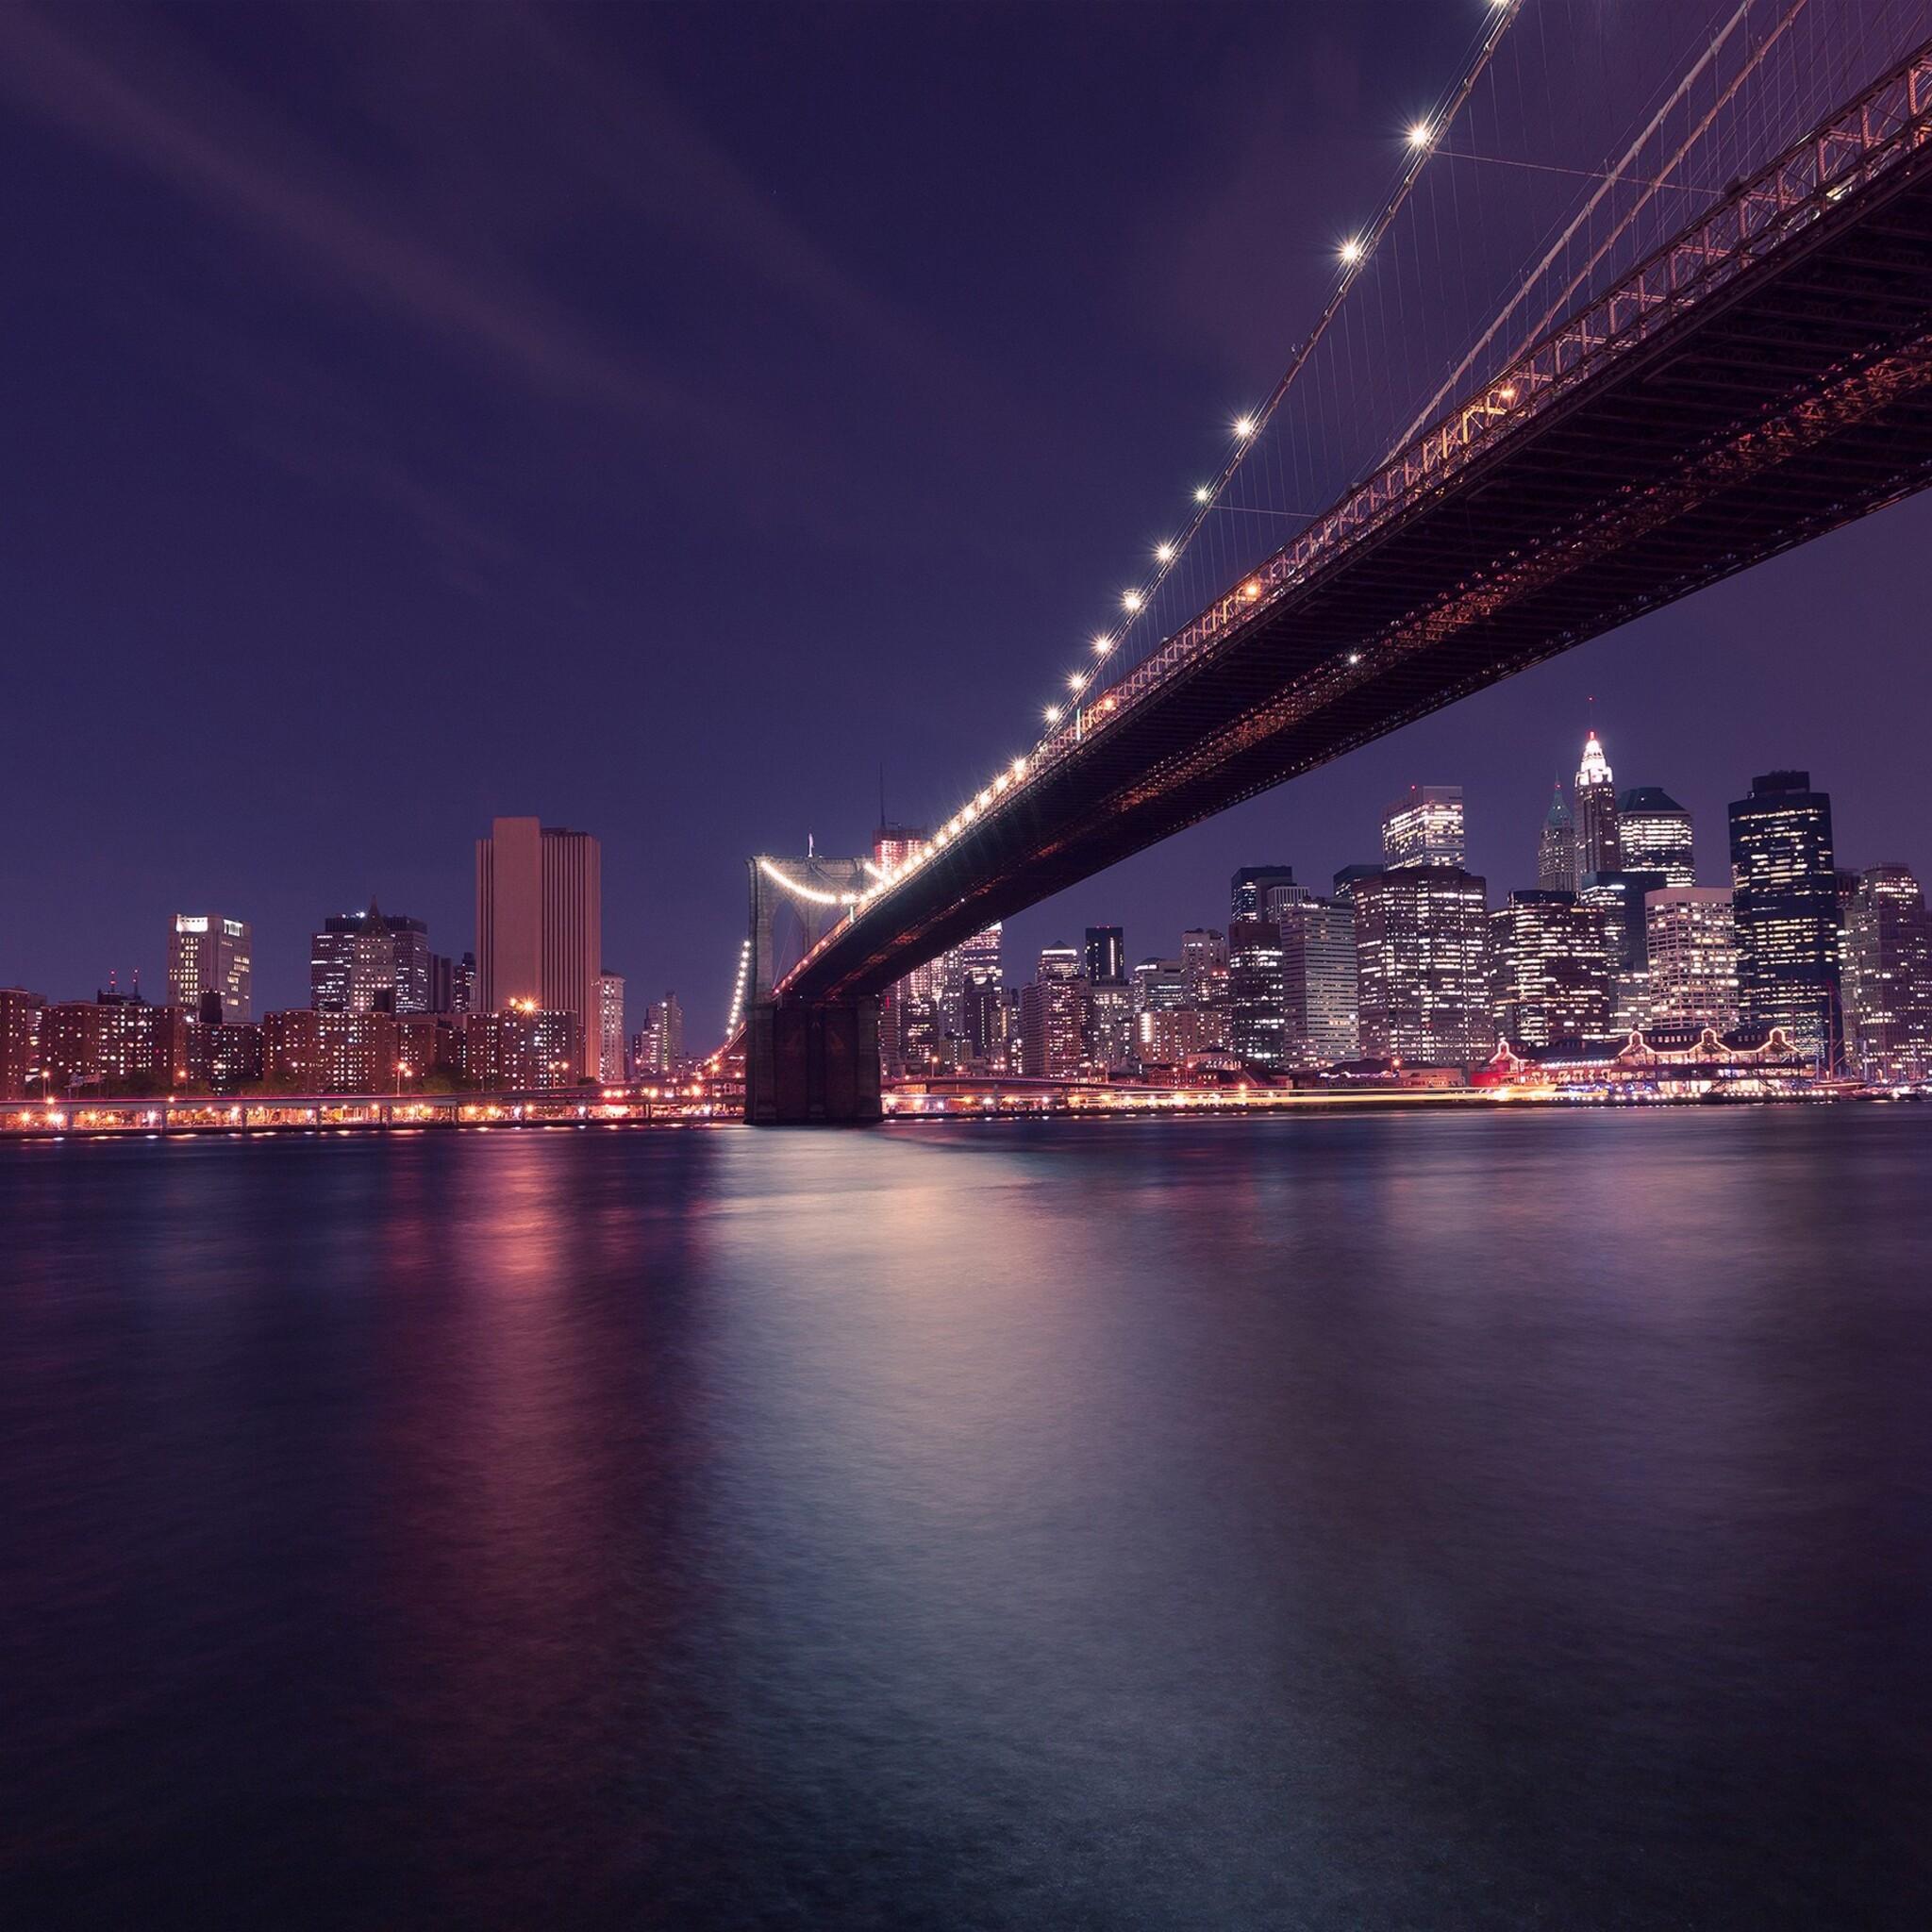 2048x2048 Brooklyn Bridge Manhattan In New York Ipad Air